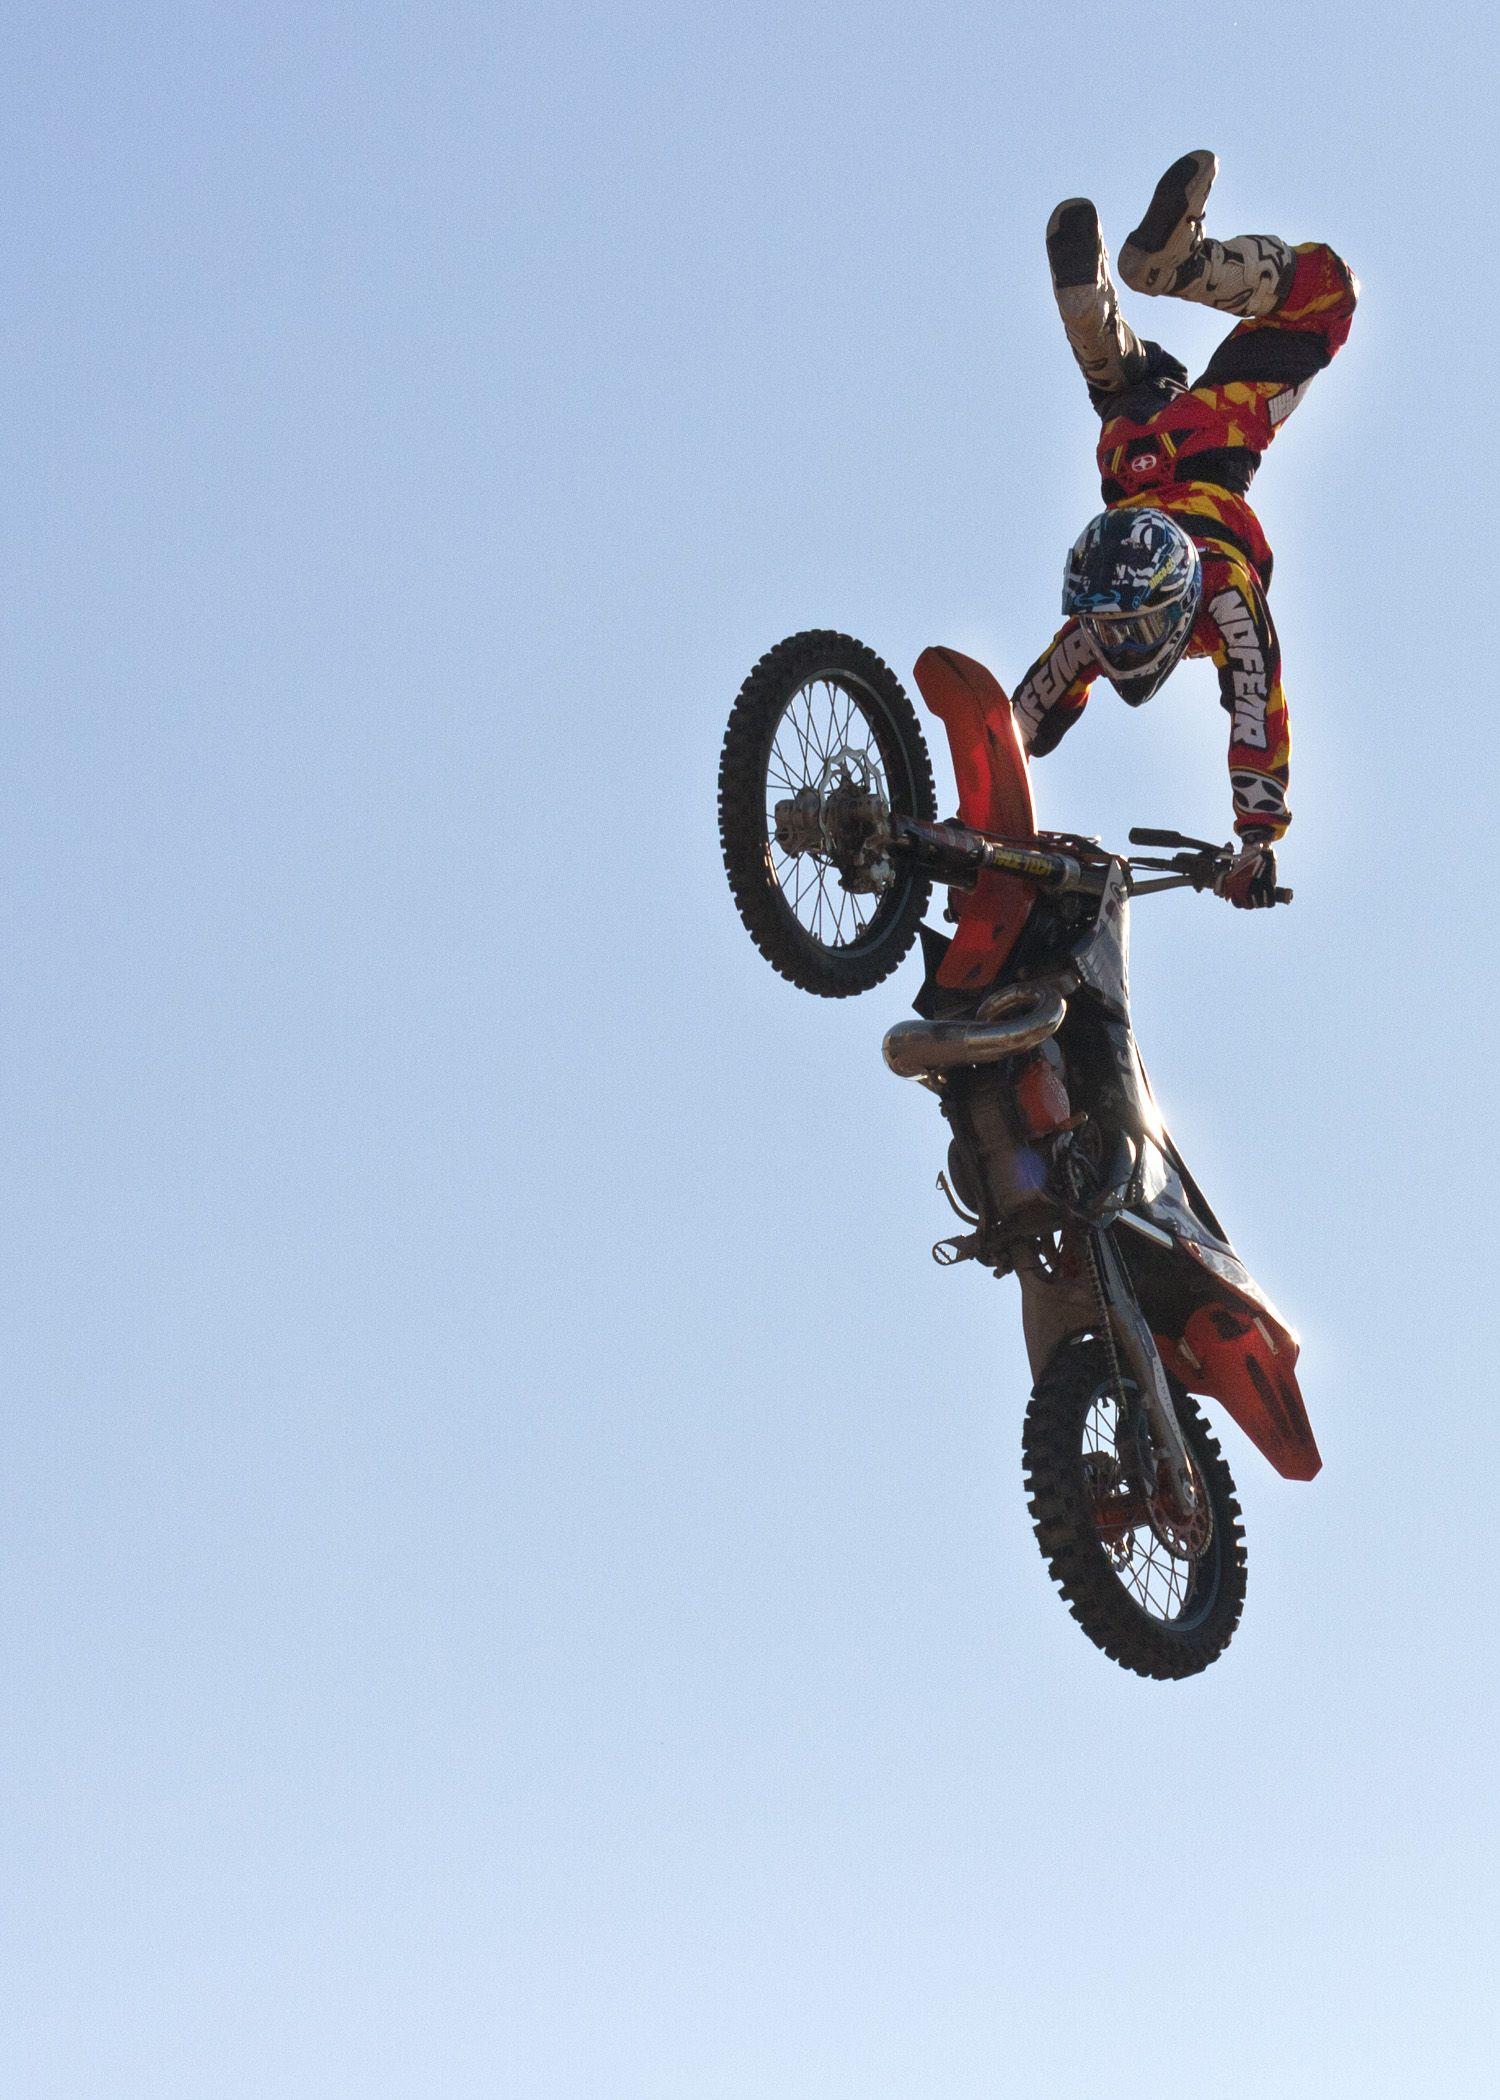 Motorcycle Dirt Bike Tricks 251 365 Cowboys Flying High Bike